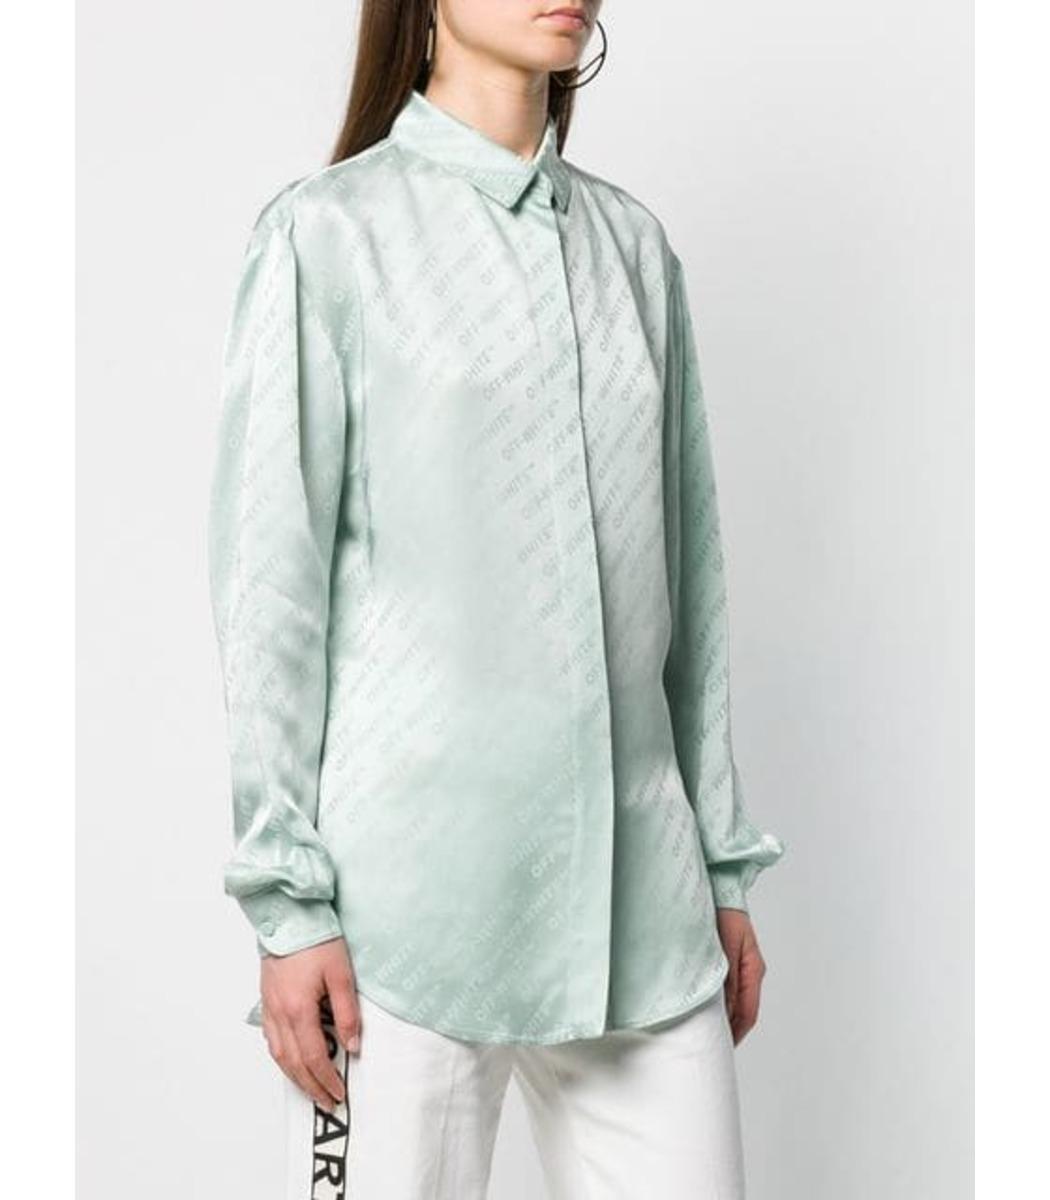 368de6d0b73680 Off-White c/o Virgil Abloh Silk Logo Button Down Shirt - Lyst